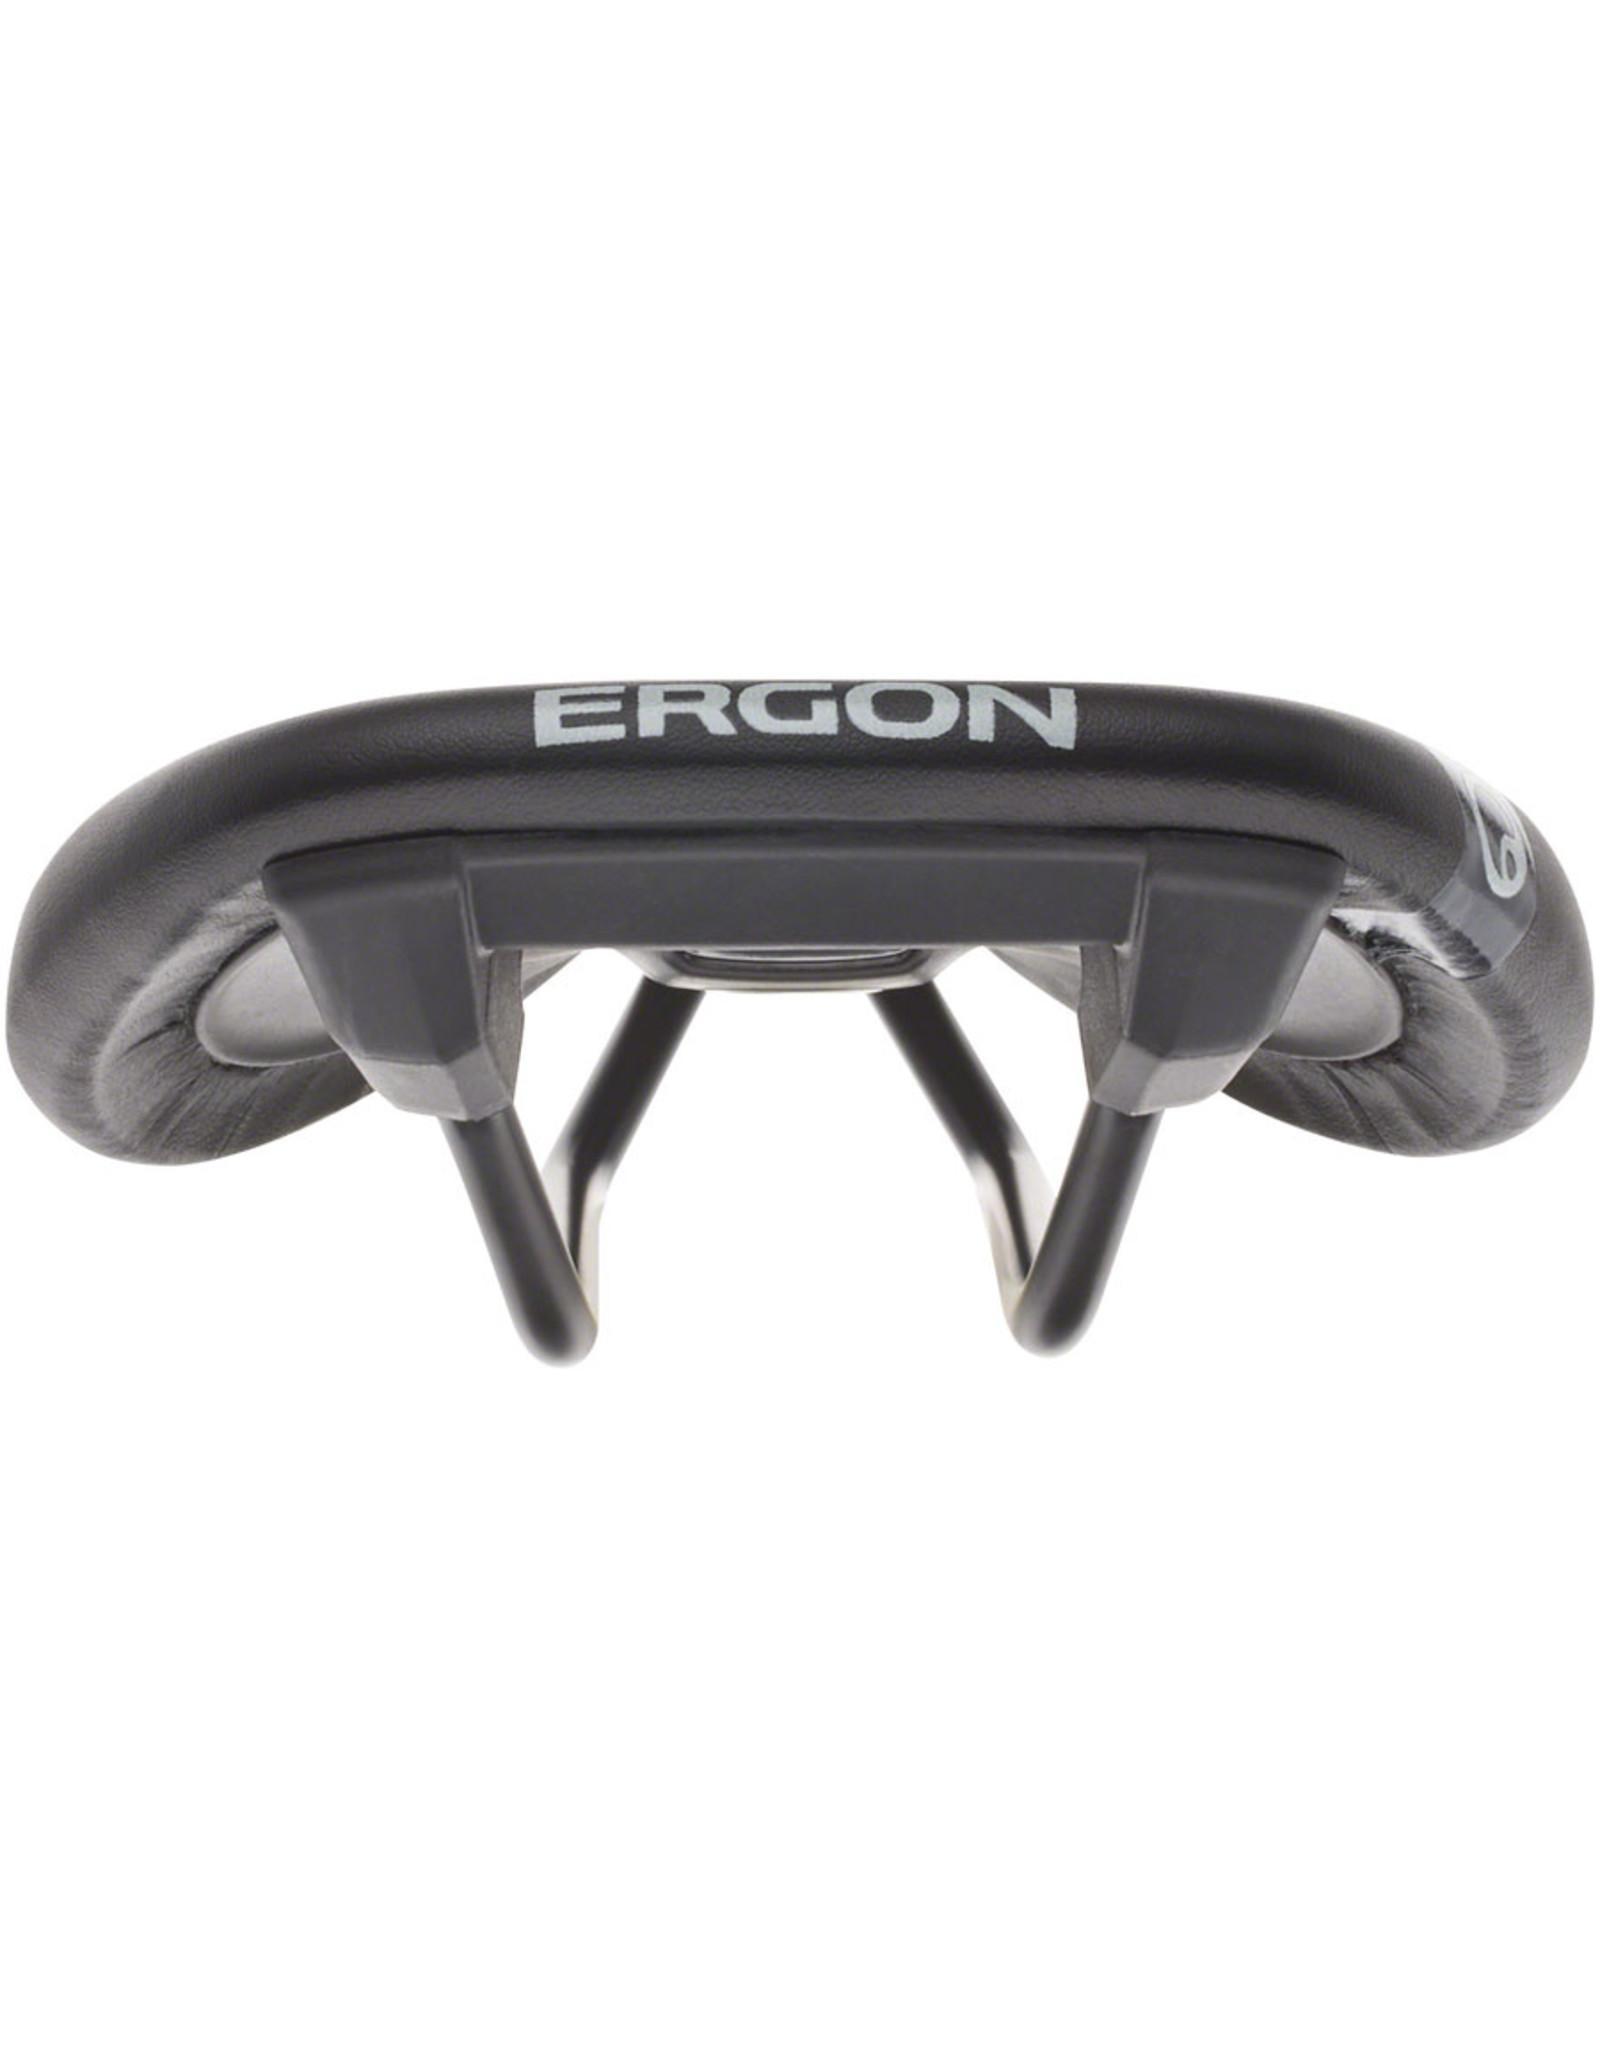 Ergon Ergon SM Sport Men's Saddle: Medium/Large, Black